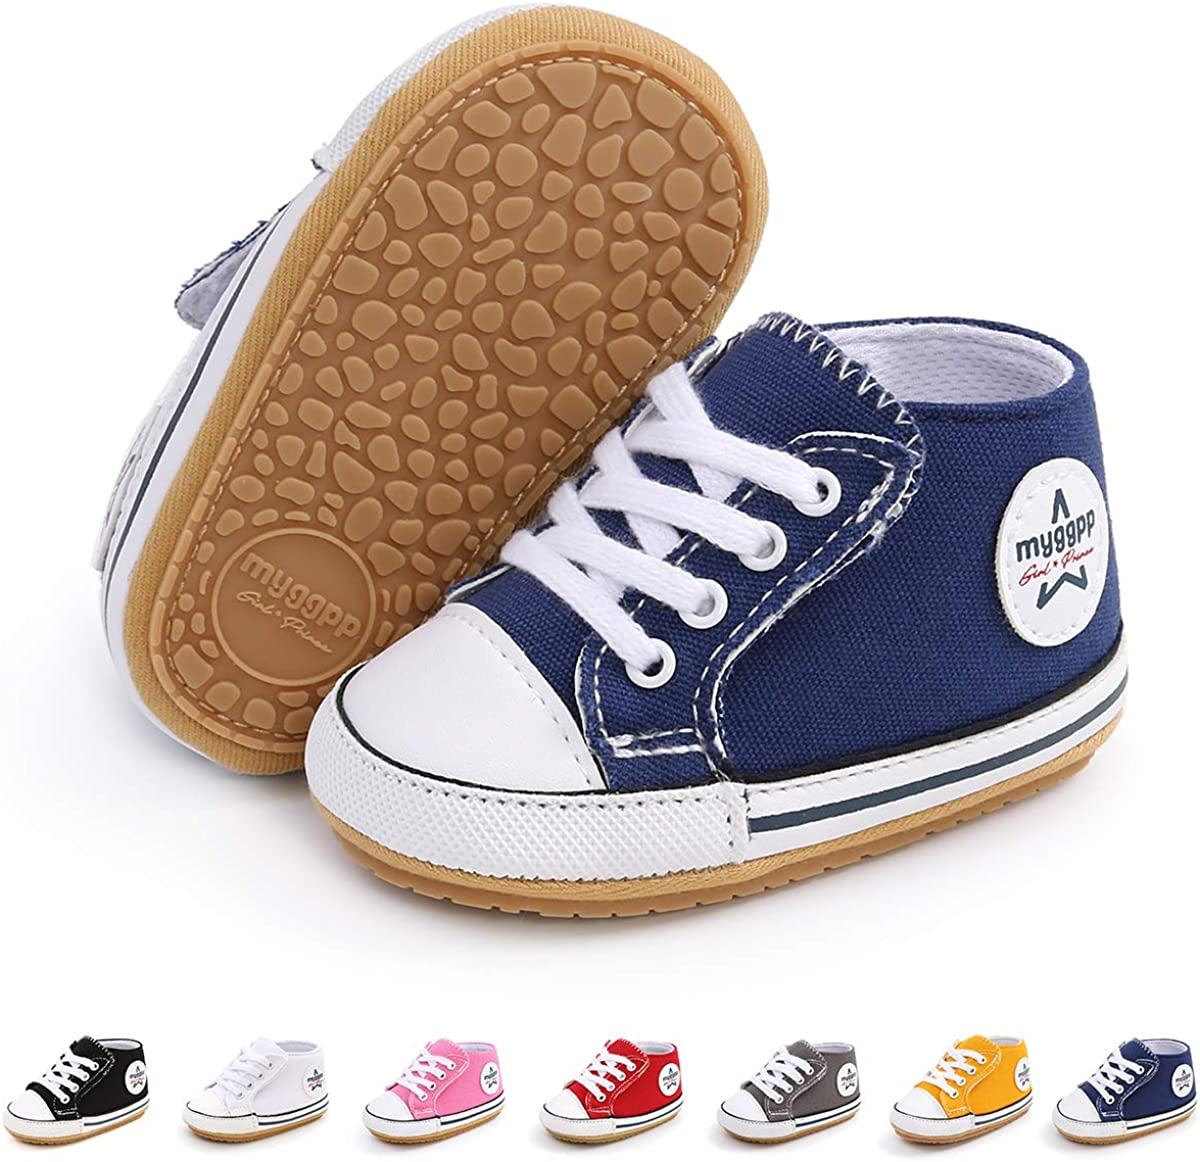 SABATUTU Unisex Baby Boys Girls Shoes Star High Top Ankle Toddler Sneaker Soft Anti-Slip Sole Newborn Infant First Walkers Canvas Denim Shoes